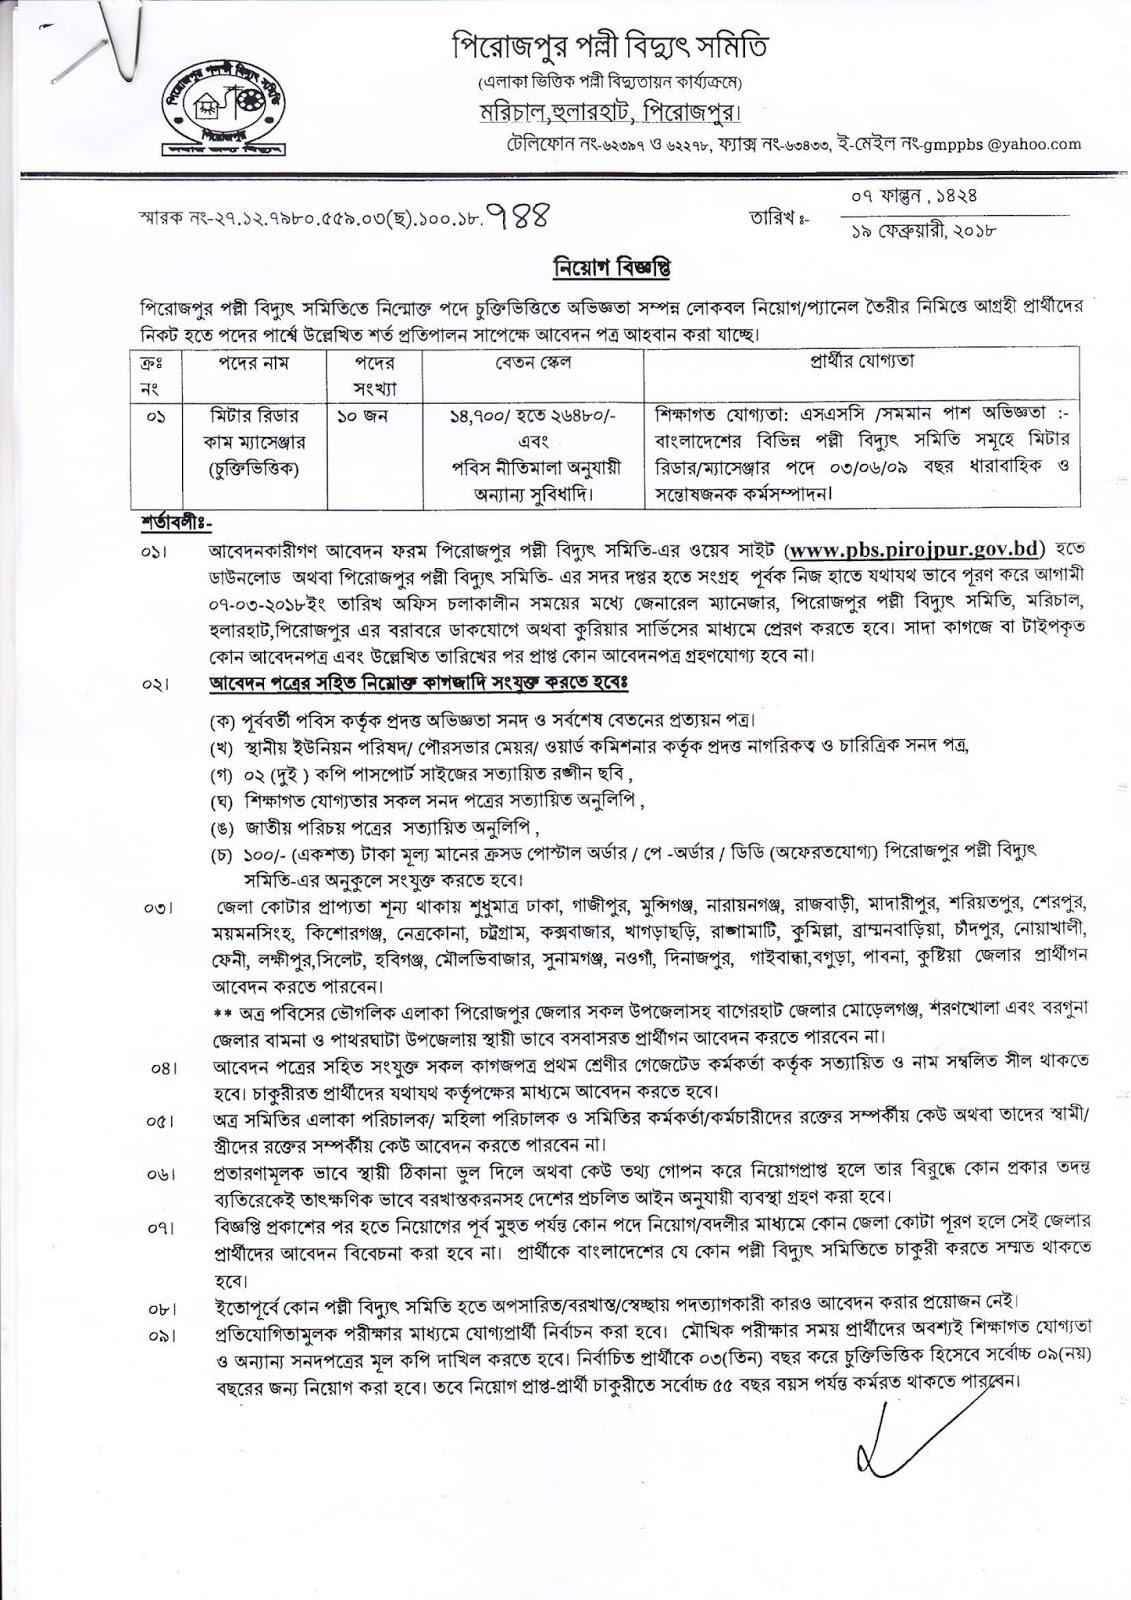 Pirojpur Palli Bidyut Samity, Morichal Job Circular 2018